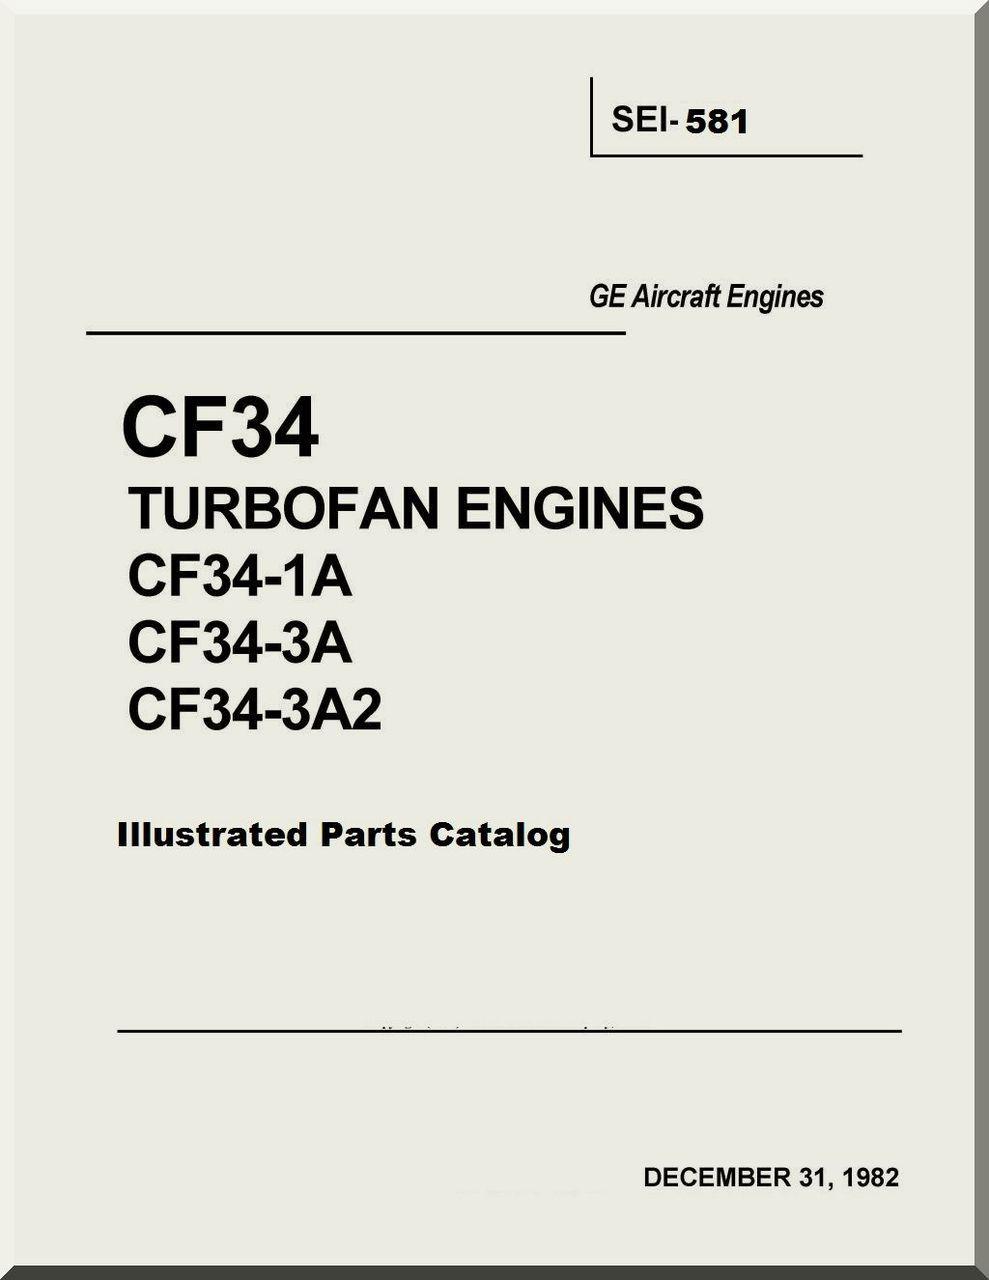 General Electric CF34 Turbofan Engines CF34-1A CF34-3A